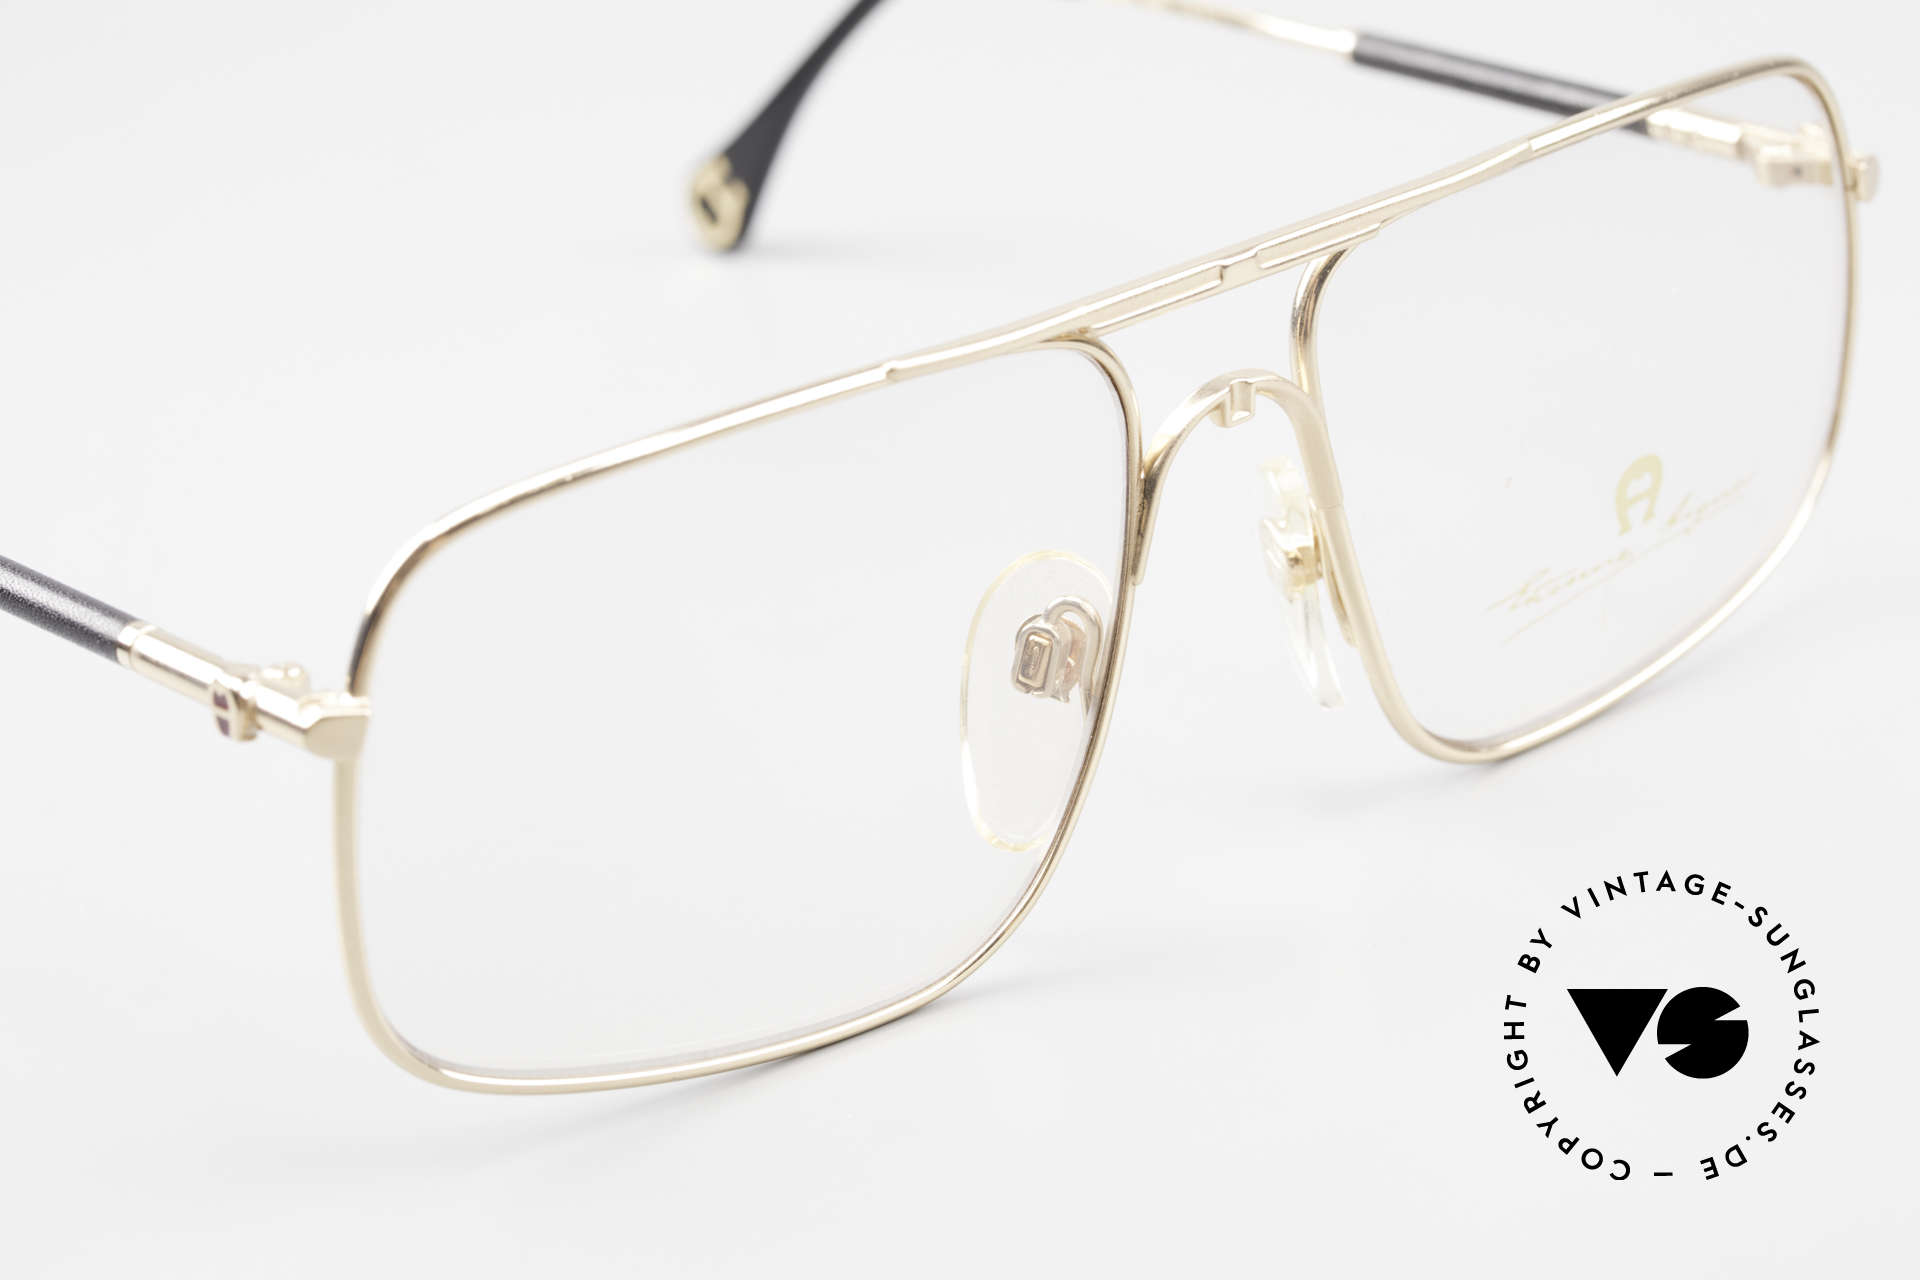 Aigner EA23 Rare 80's Vintage Eyeglasses, never worn (like all our rare 80's Aigner eyeglasses), Made for Men